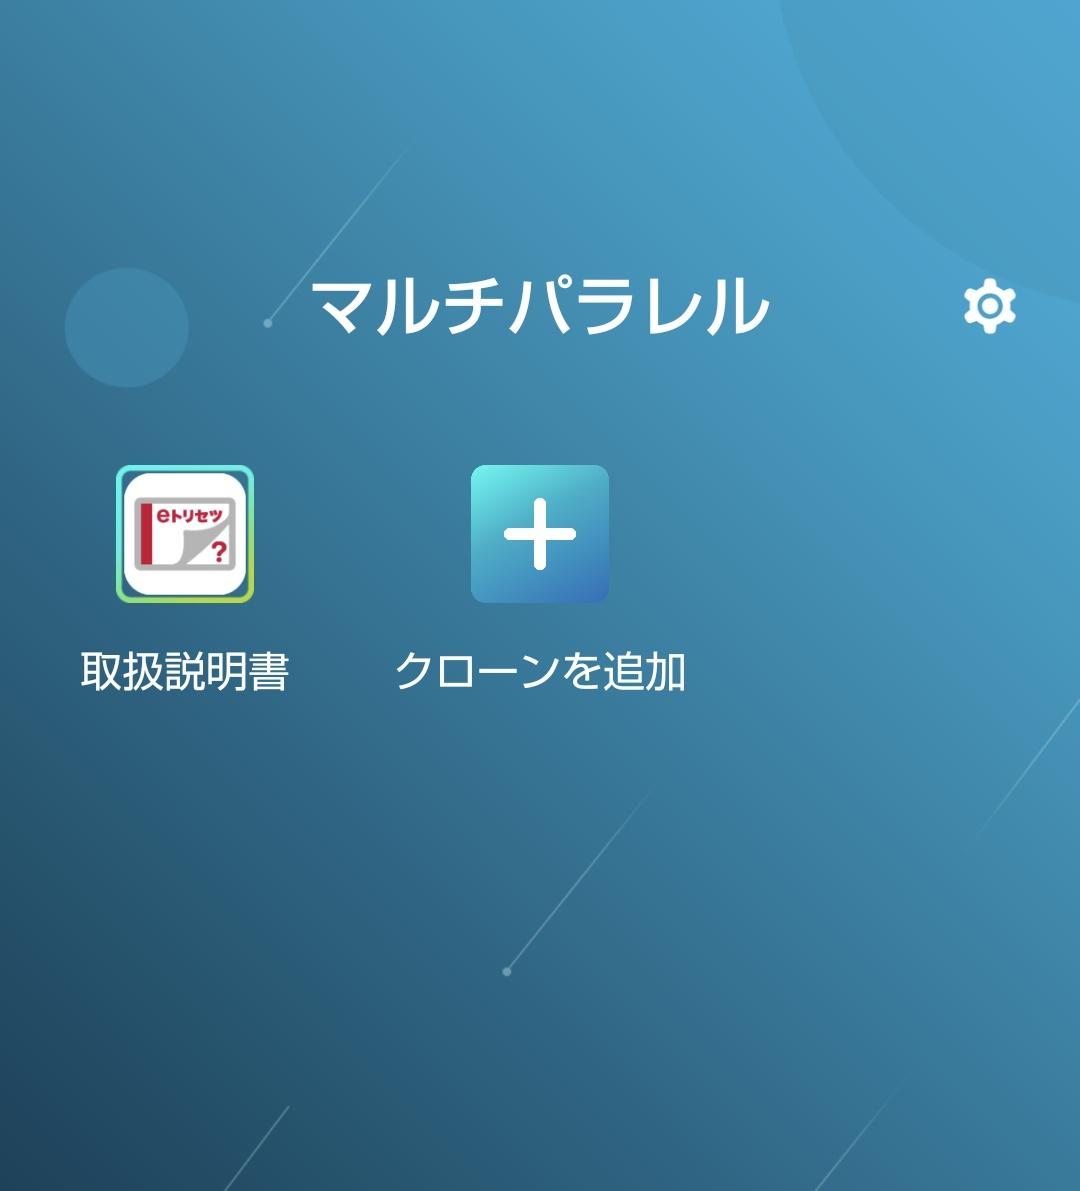 f:id:koiwai_chinatsu:20191225143315j:plain